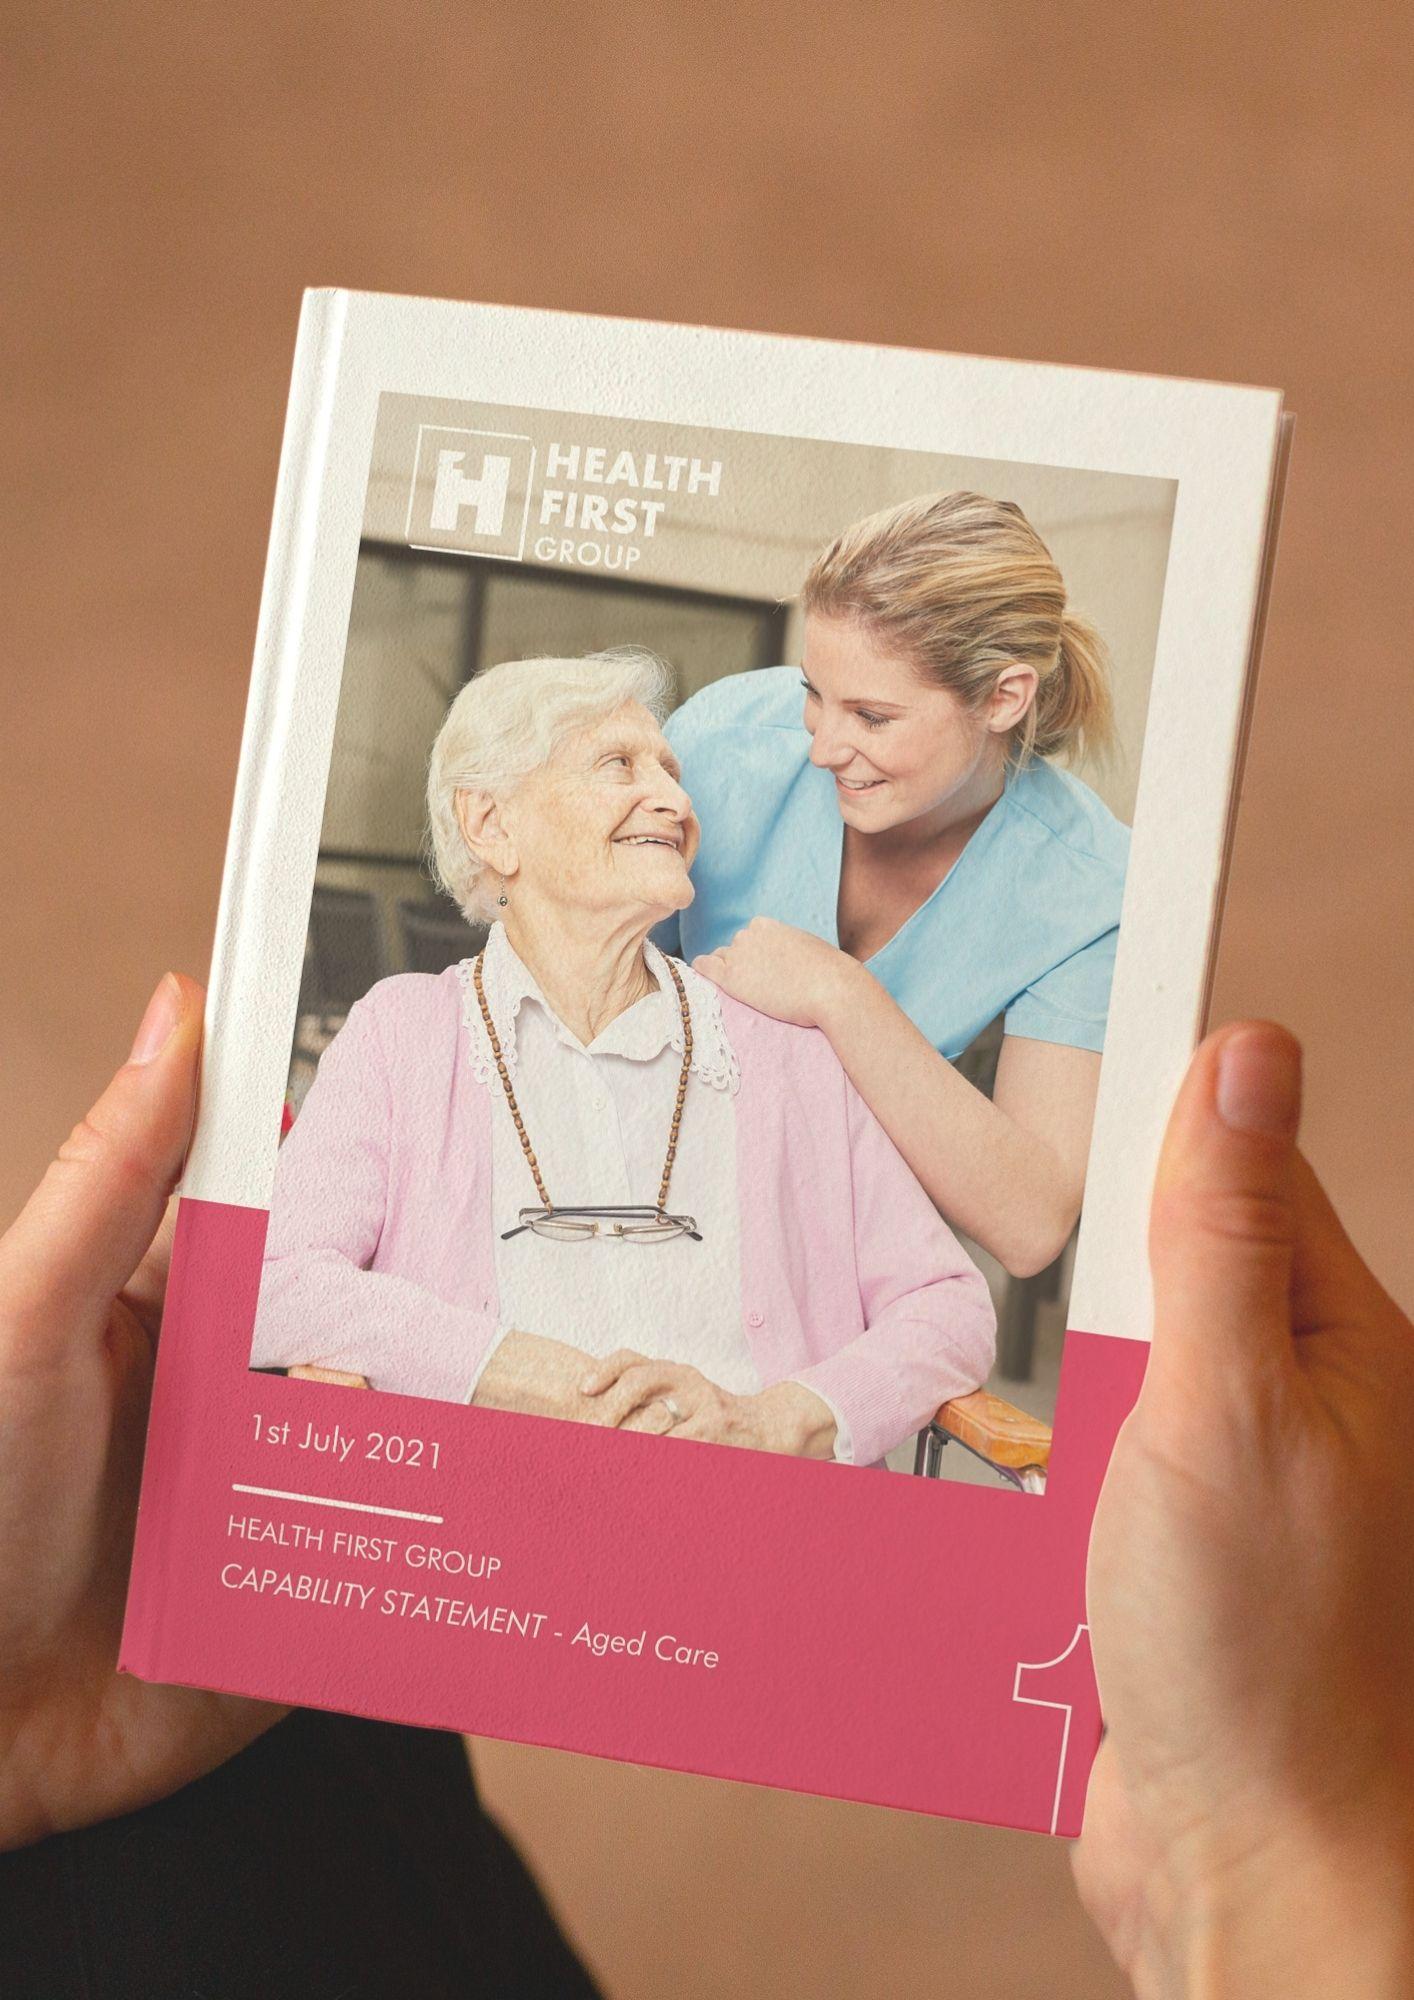 Aged Care Cap Statement Embed Design